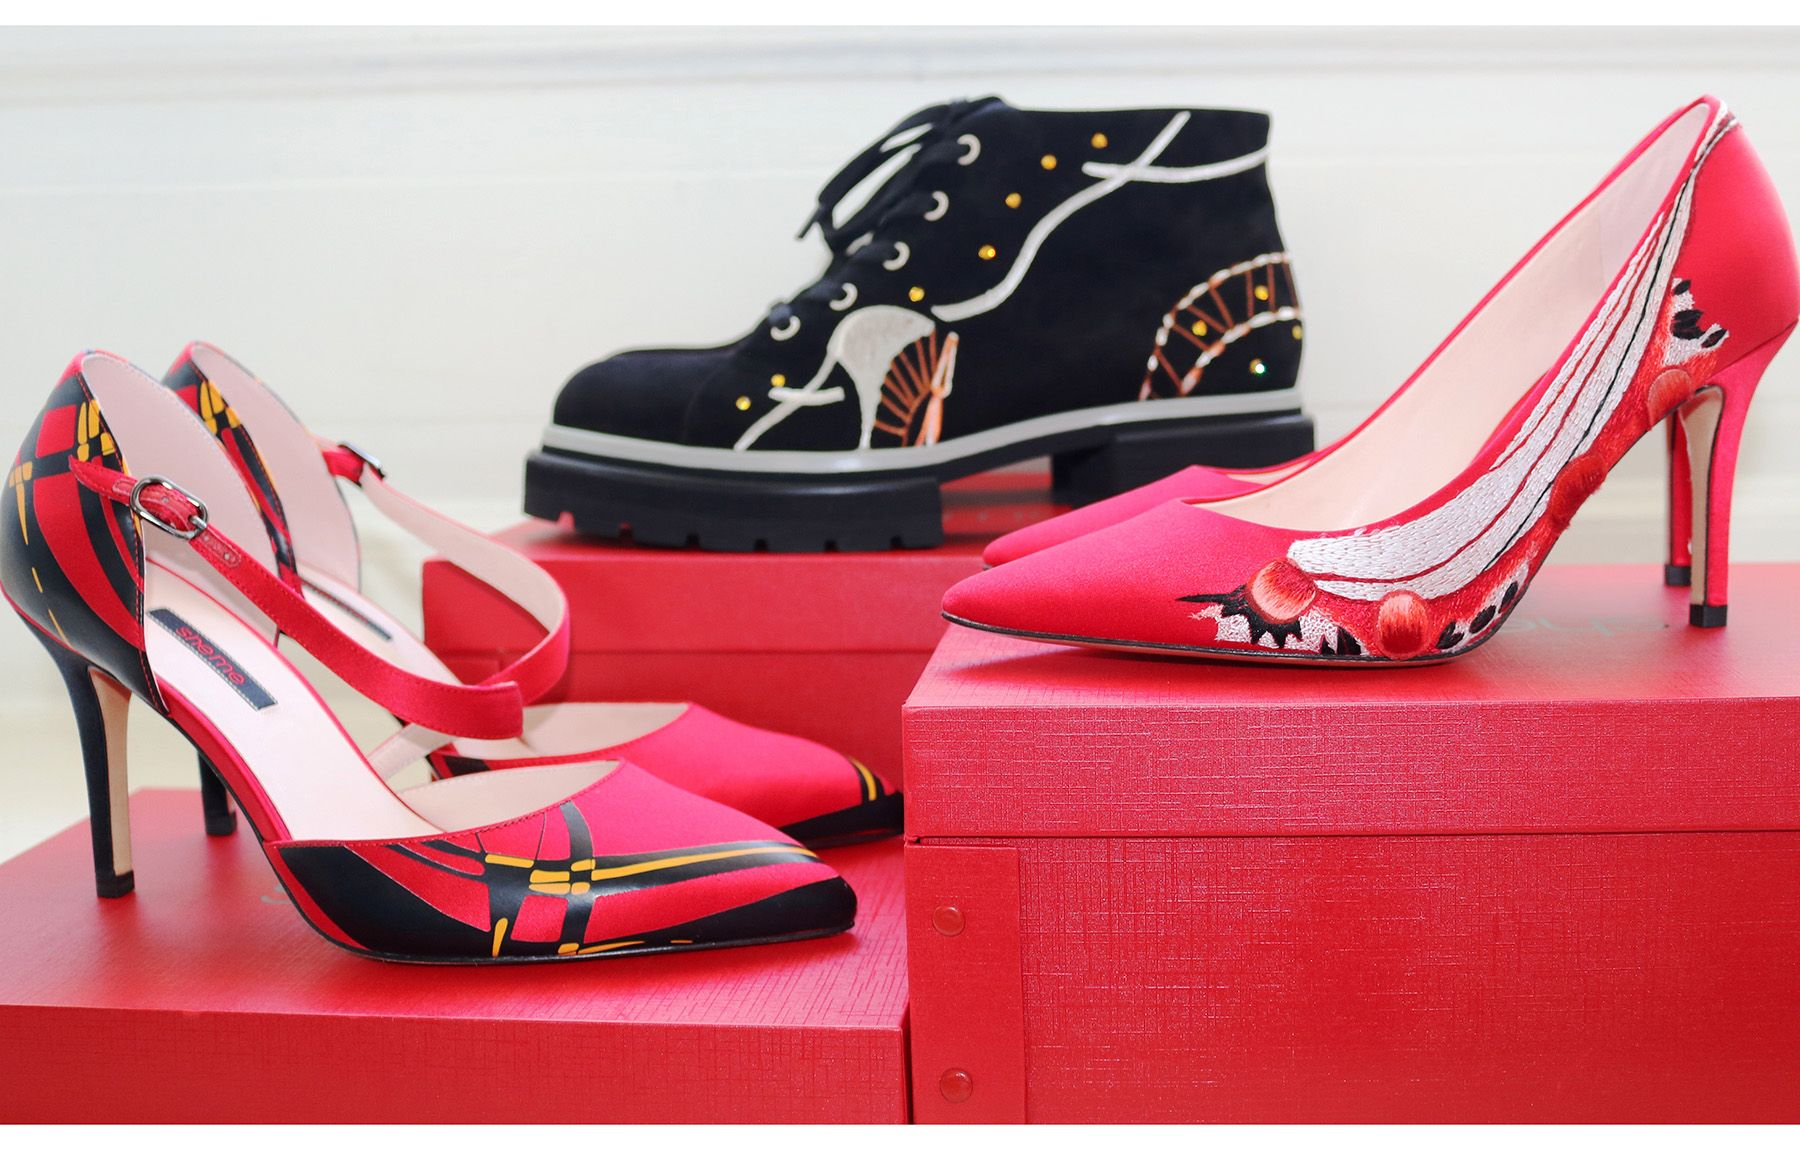 Royal School of Needlework + Sheme shoes